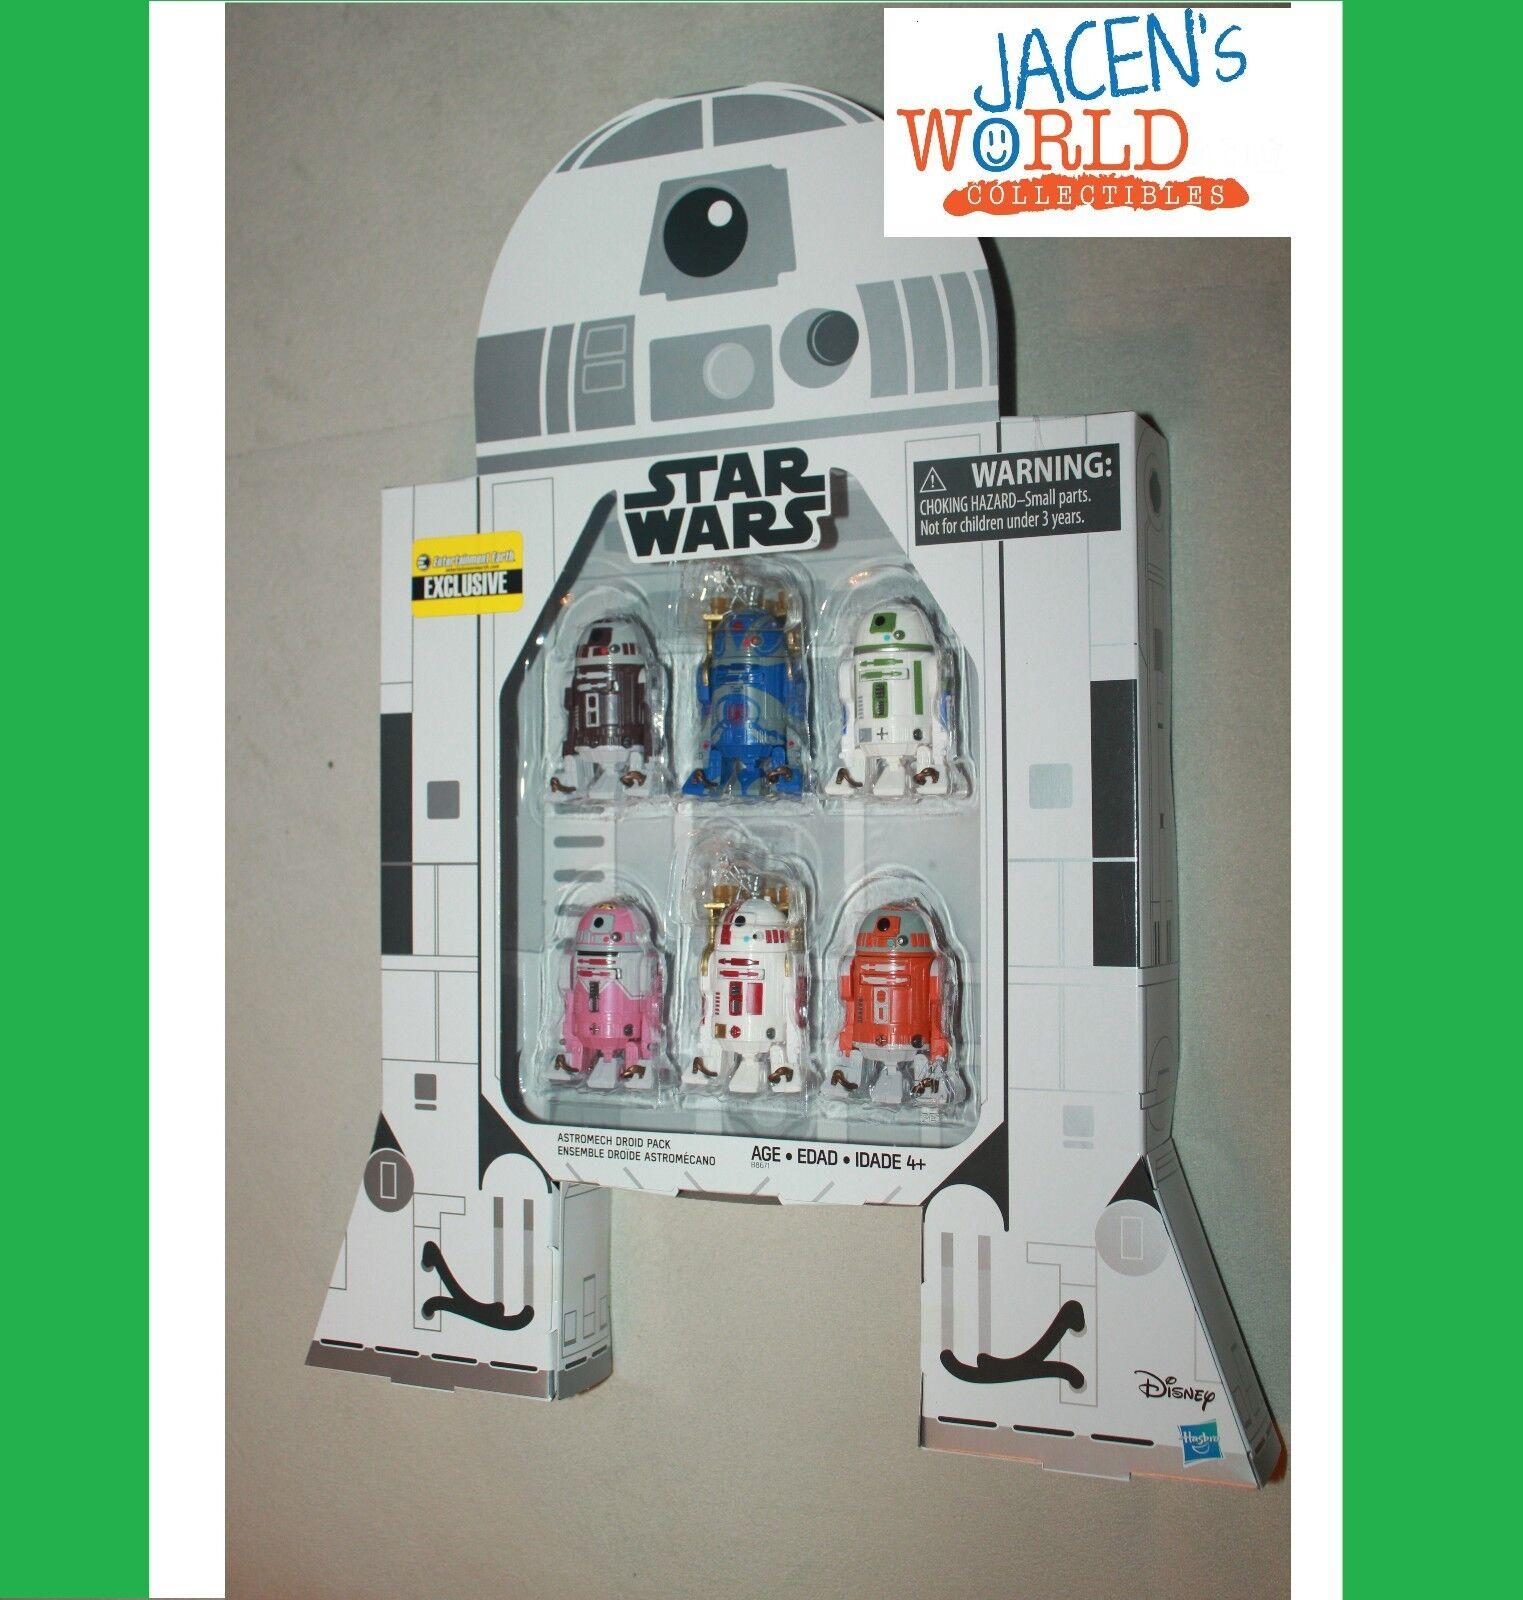 Astromech - set star wars r7-f5 qt-kt r7-d4 r2-c2 r2-a5 jabba barkeeper